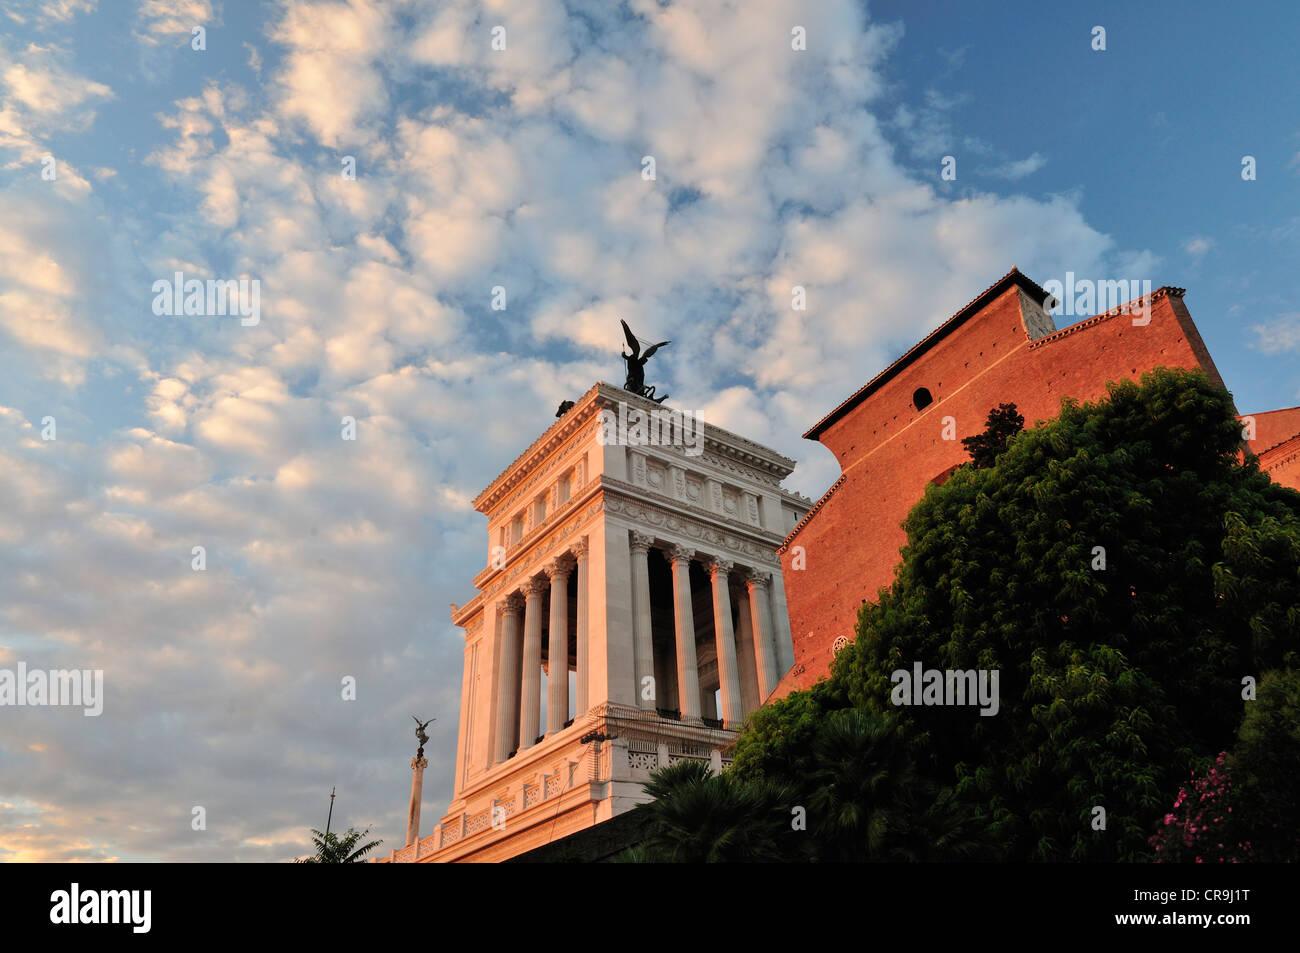 Le Vittoriano, pays autel, Unknow Soldier Monument, Place de Venise, Rome, Latium, Italie, Europe Photo Stock